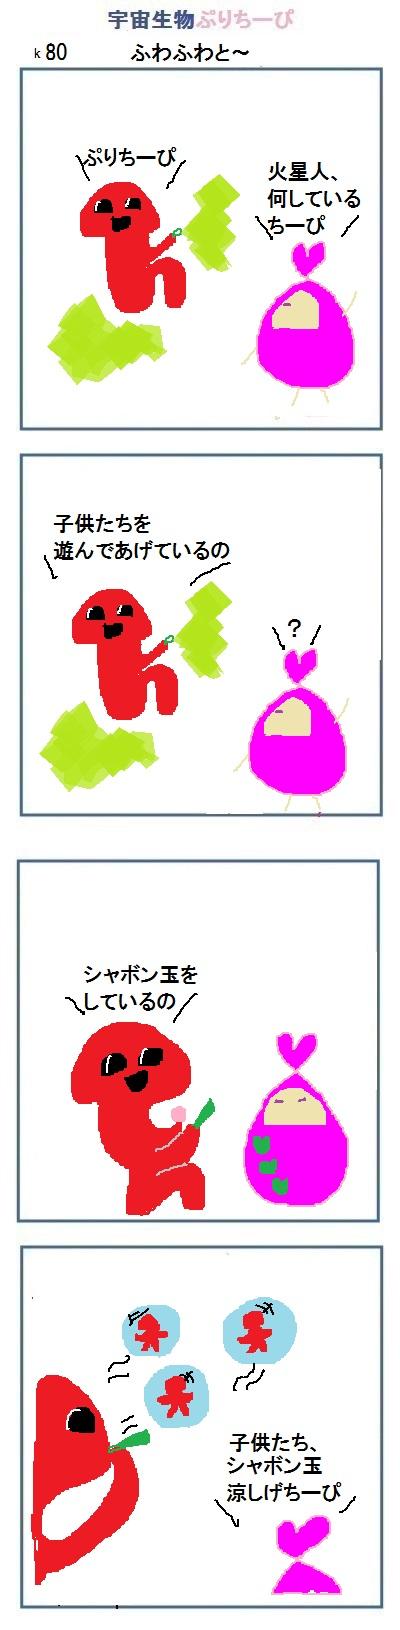 160824_k80.jpg